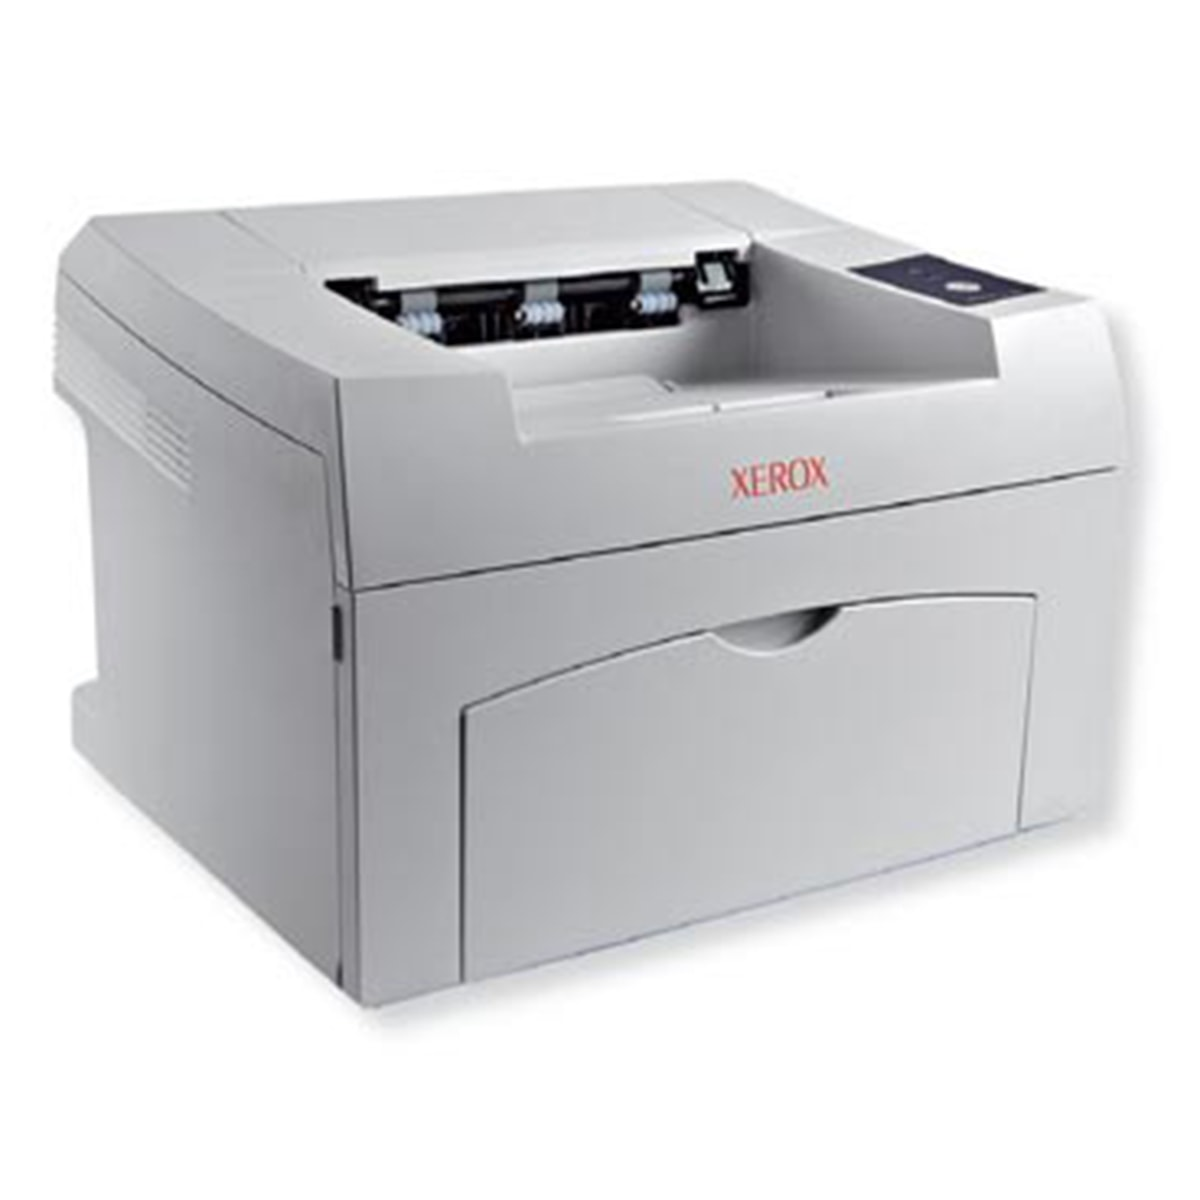 Impressora Laser Monocromática Xerox Phaser 3125 com Toner - Nova OEM